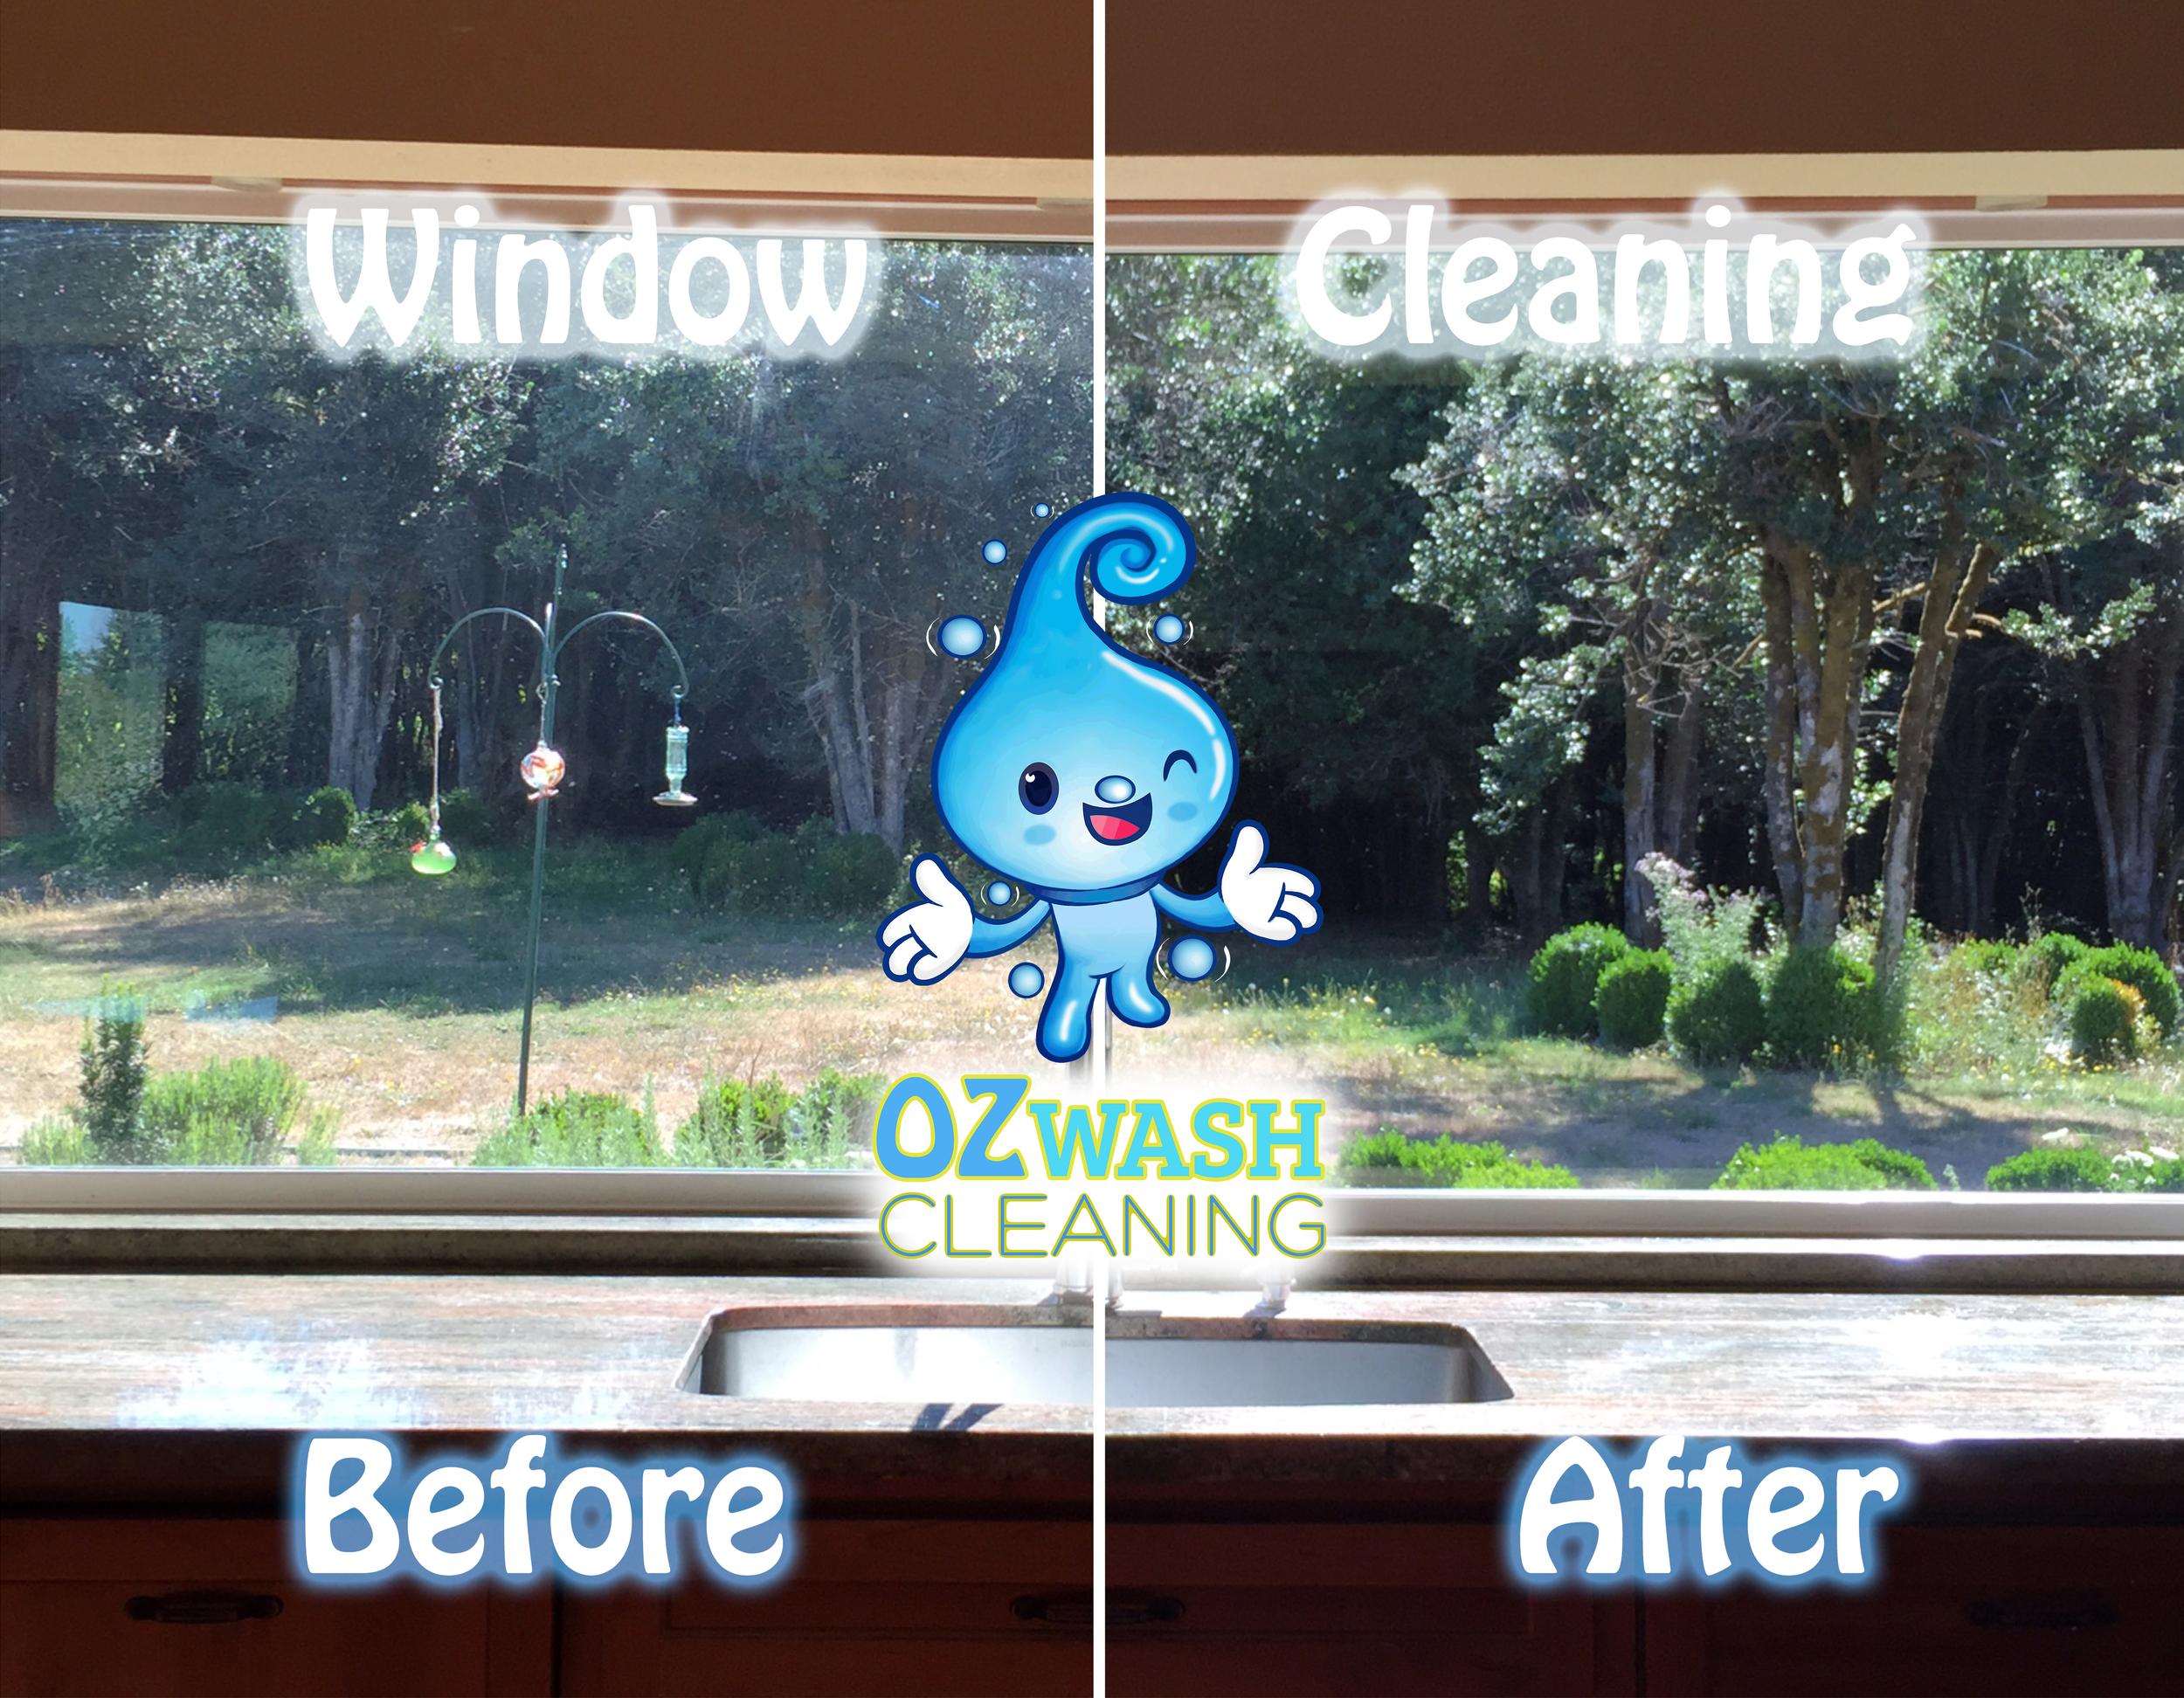 windowcleaning2.jpg